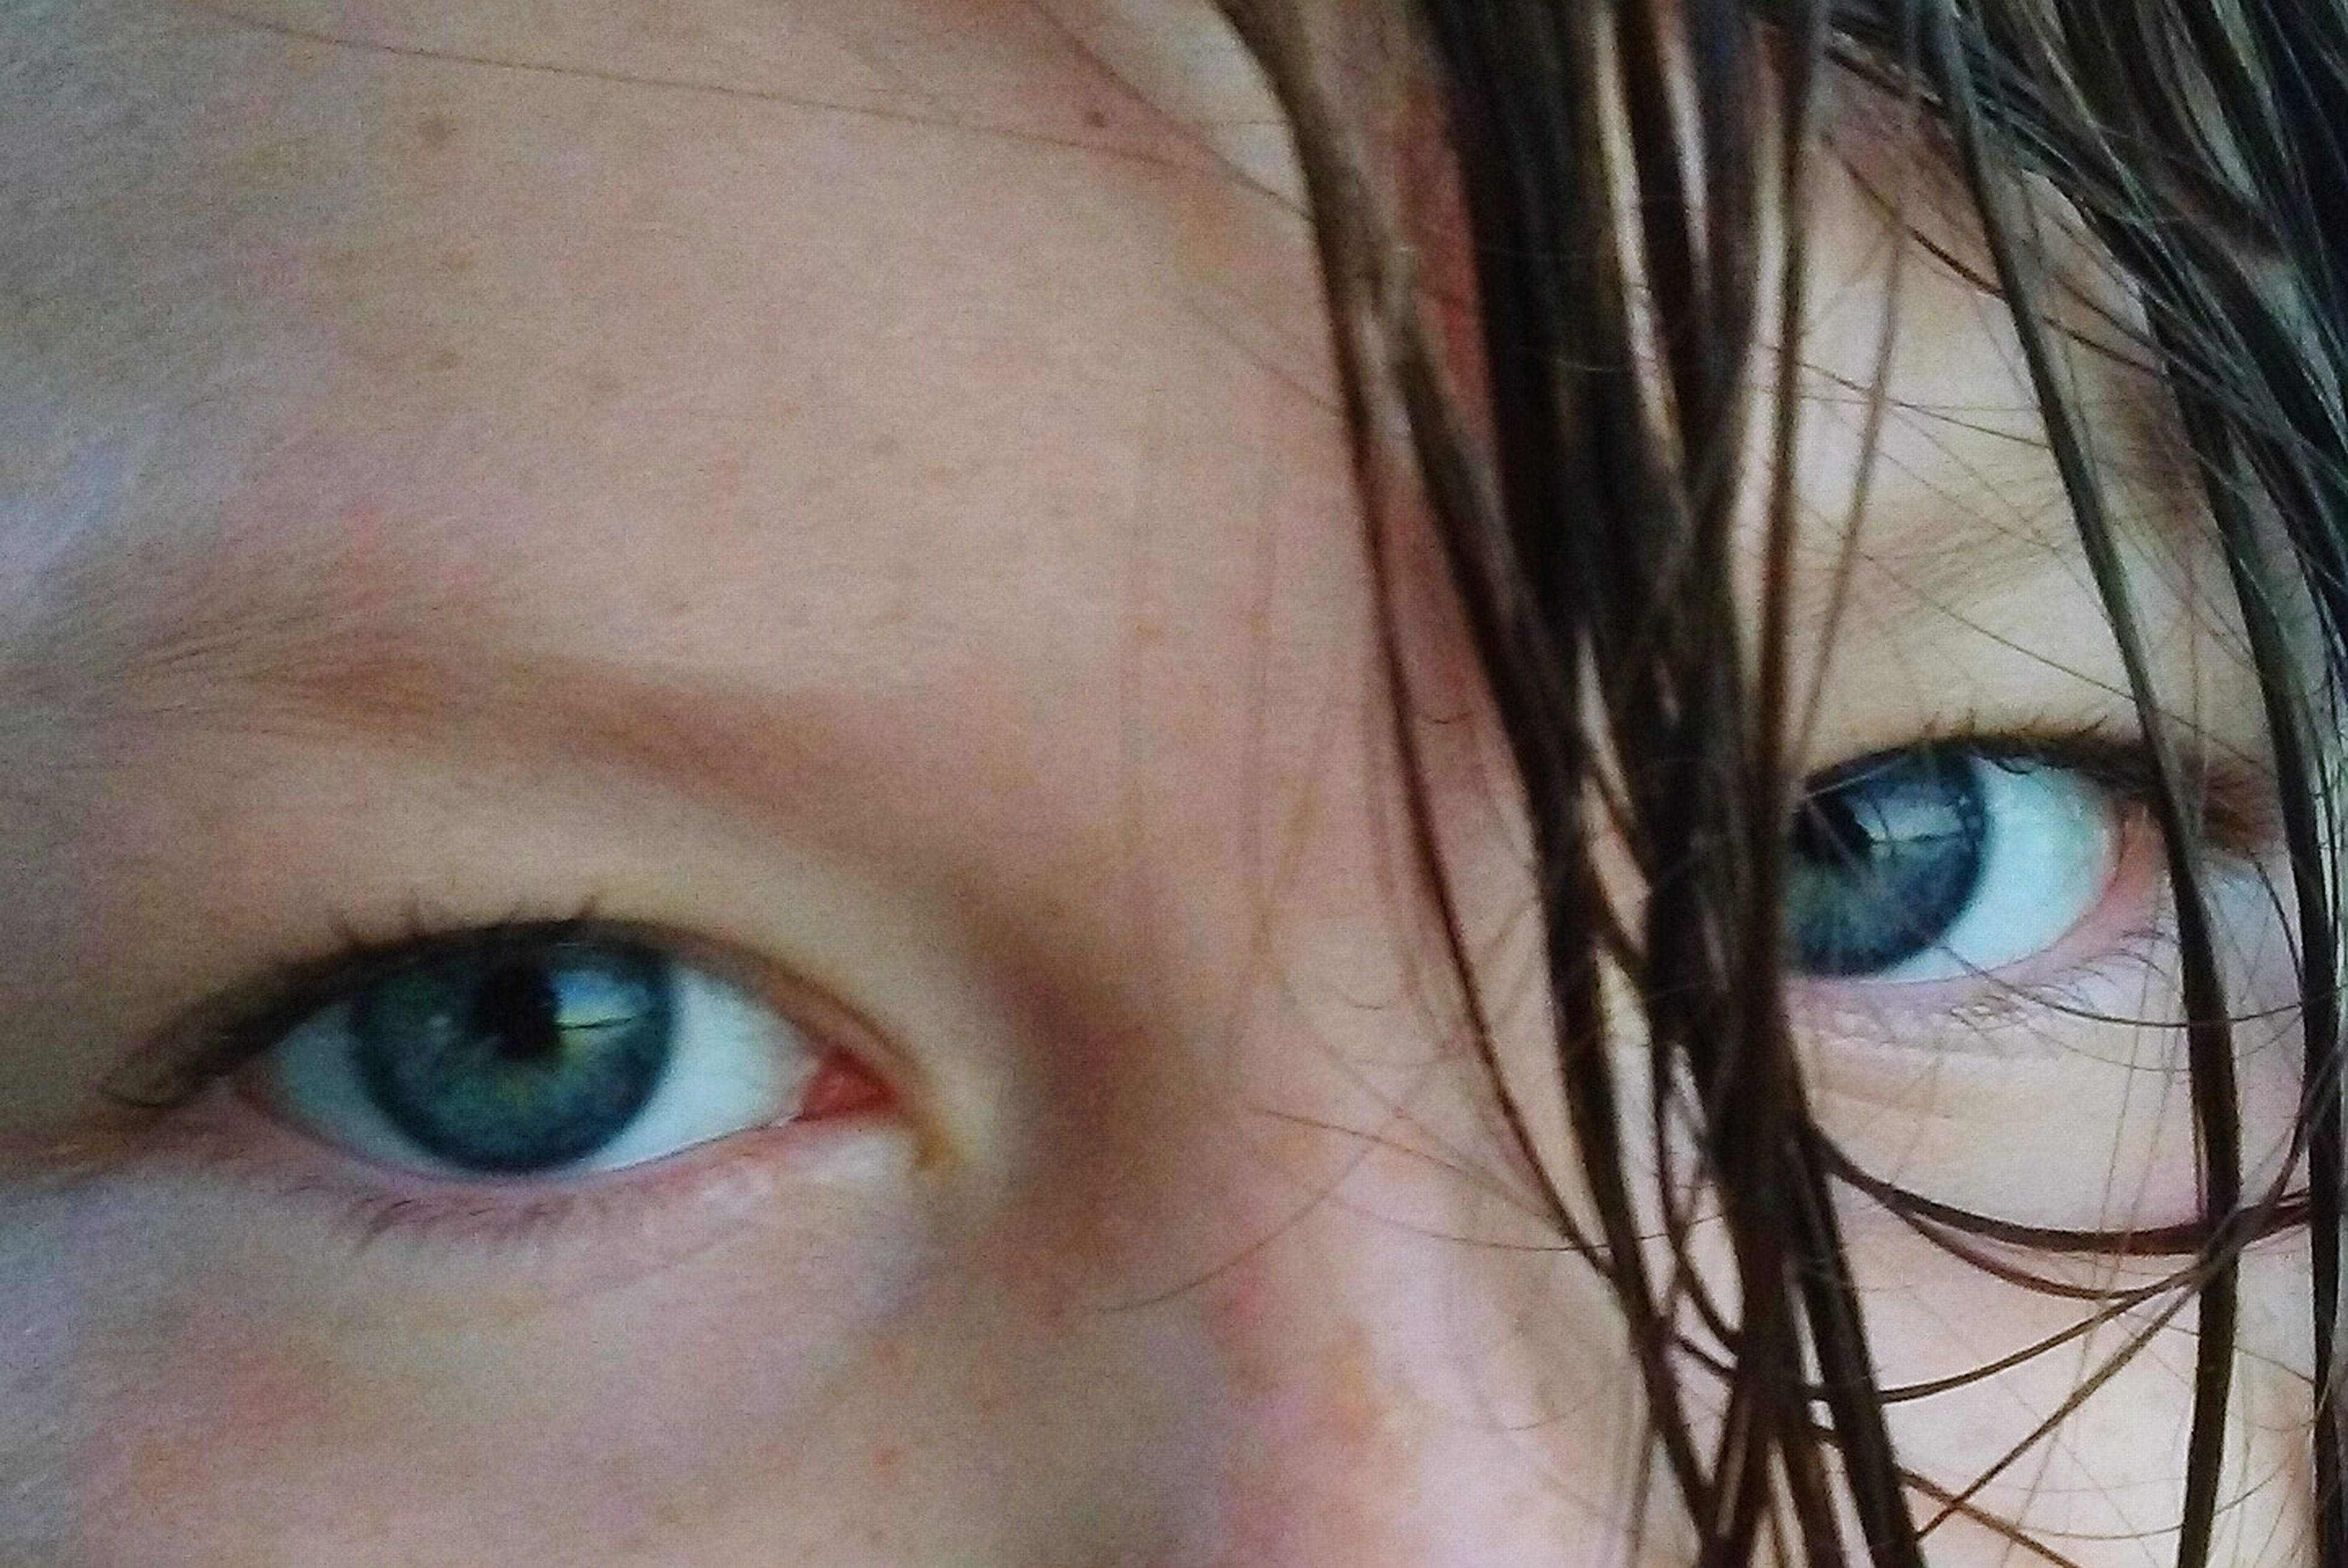 looking at camera, human eye, portrait, close-up, part of, human face, headshot, green eyes, staring, eyelash, young adult, person, eyesight, focus on foreground, beauty, eyebrow, eyeball